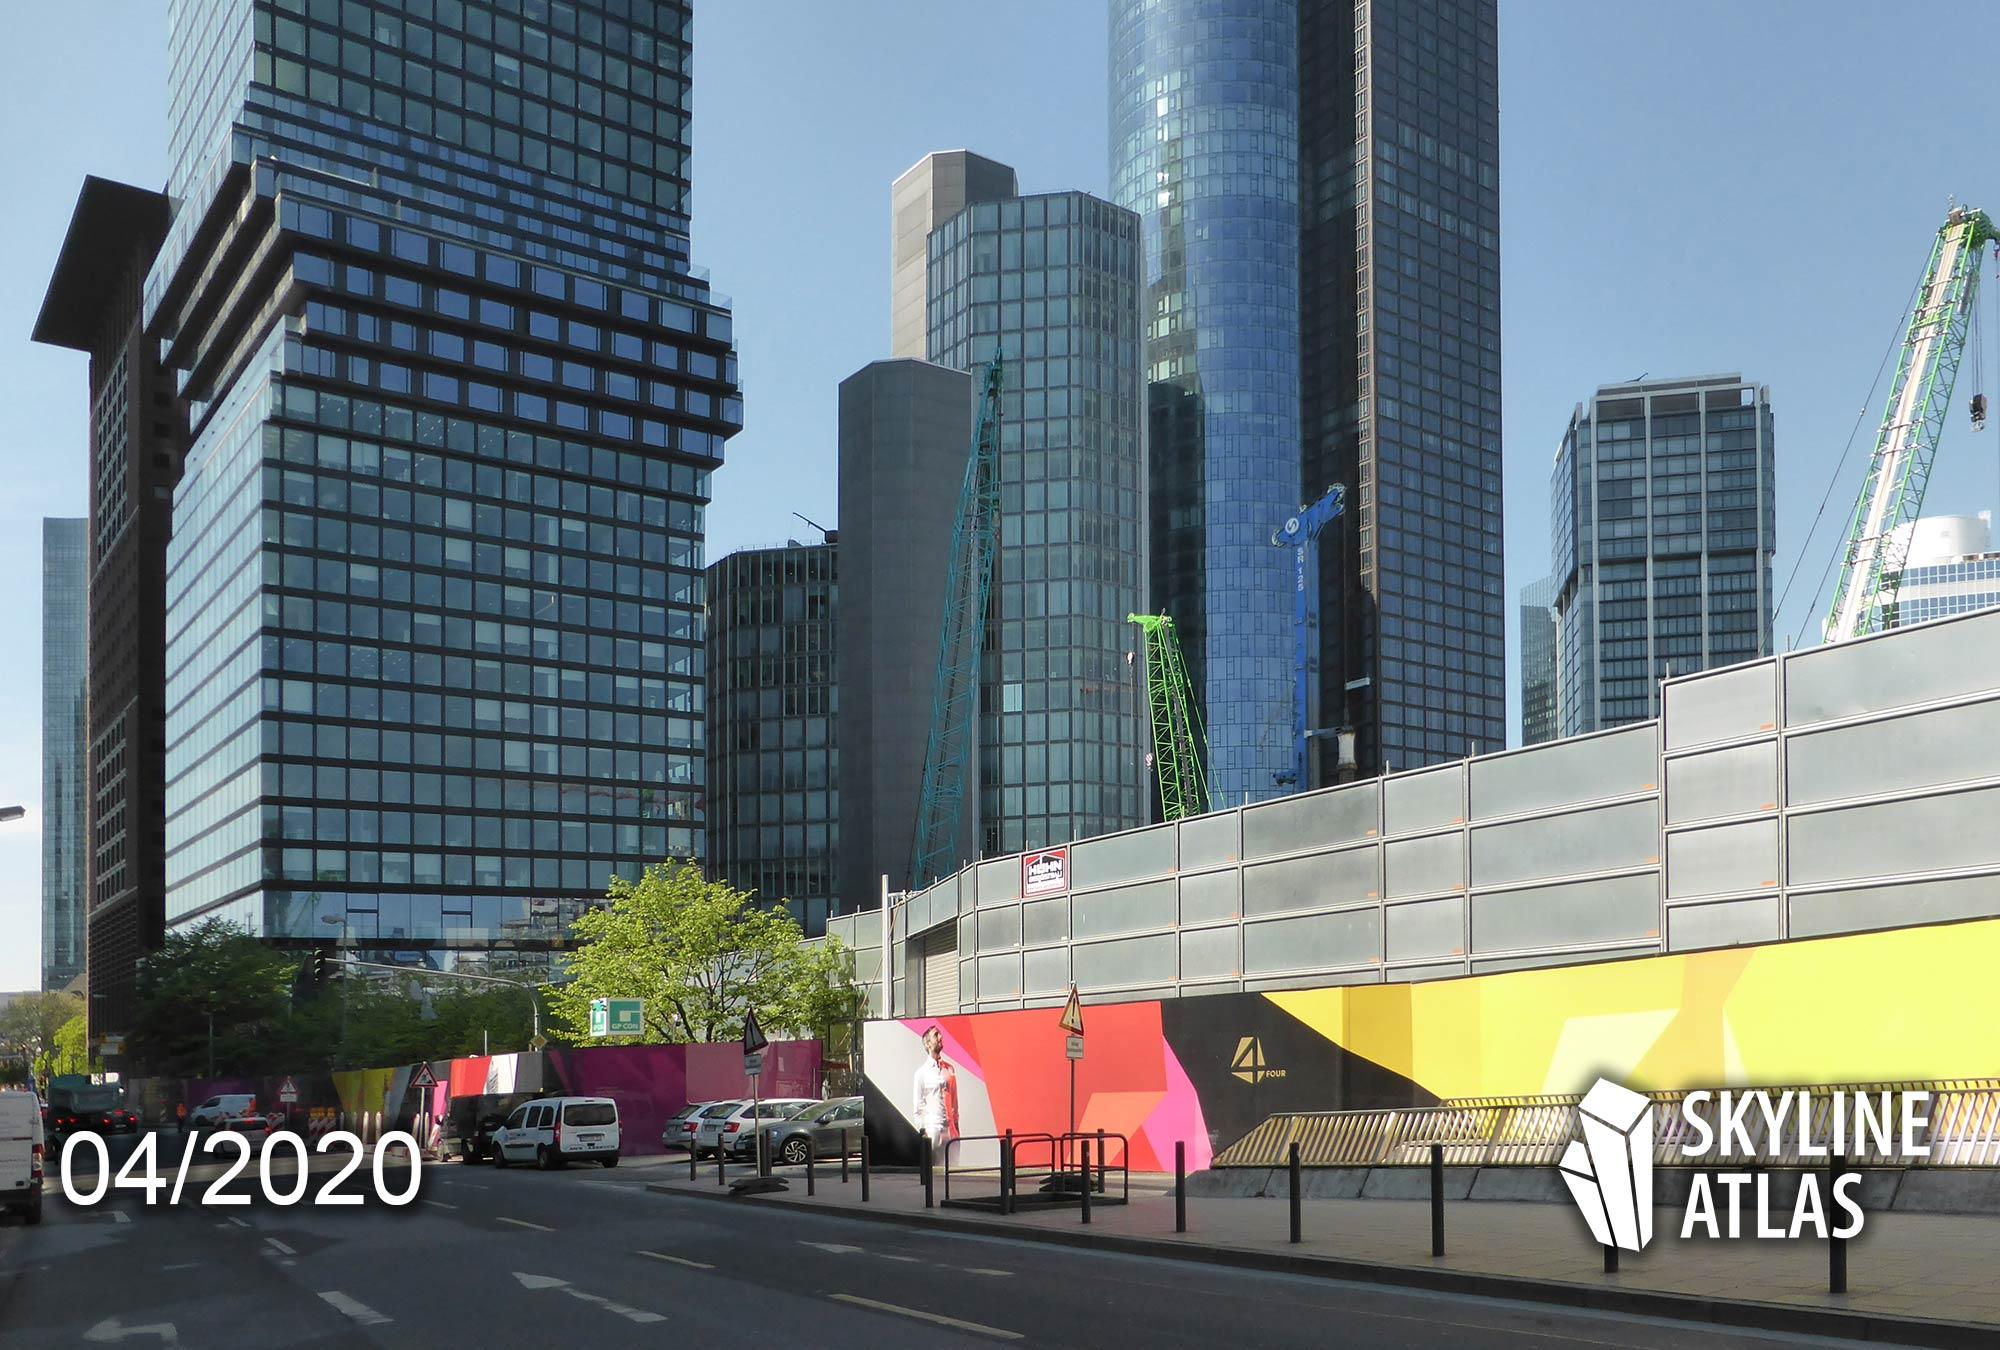 4Frankfurt - FOUR FRANKFURT - Baustelle im April 2020 - Neues Hochhauscluster CBD Frankfurt